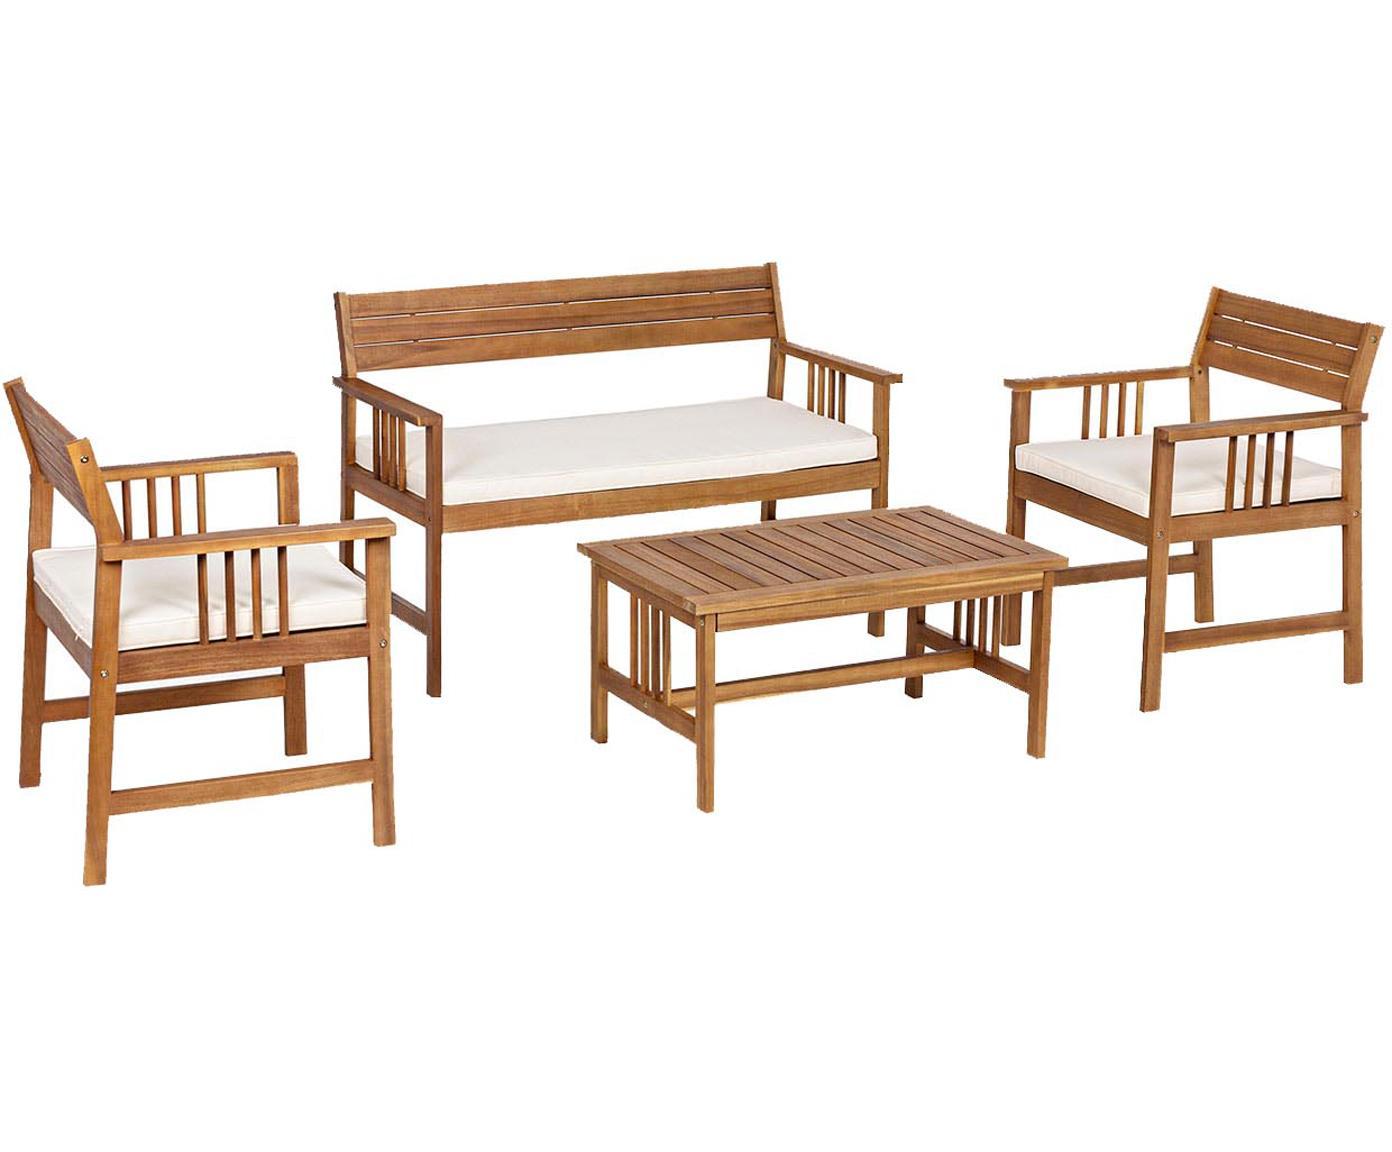 Set lounge de exterior Noemi, 4pzas., Estructura: madera de acacia con acab, Marrón, beige, Tamaños diferentes